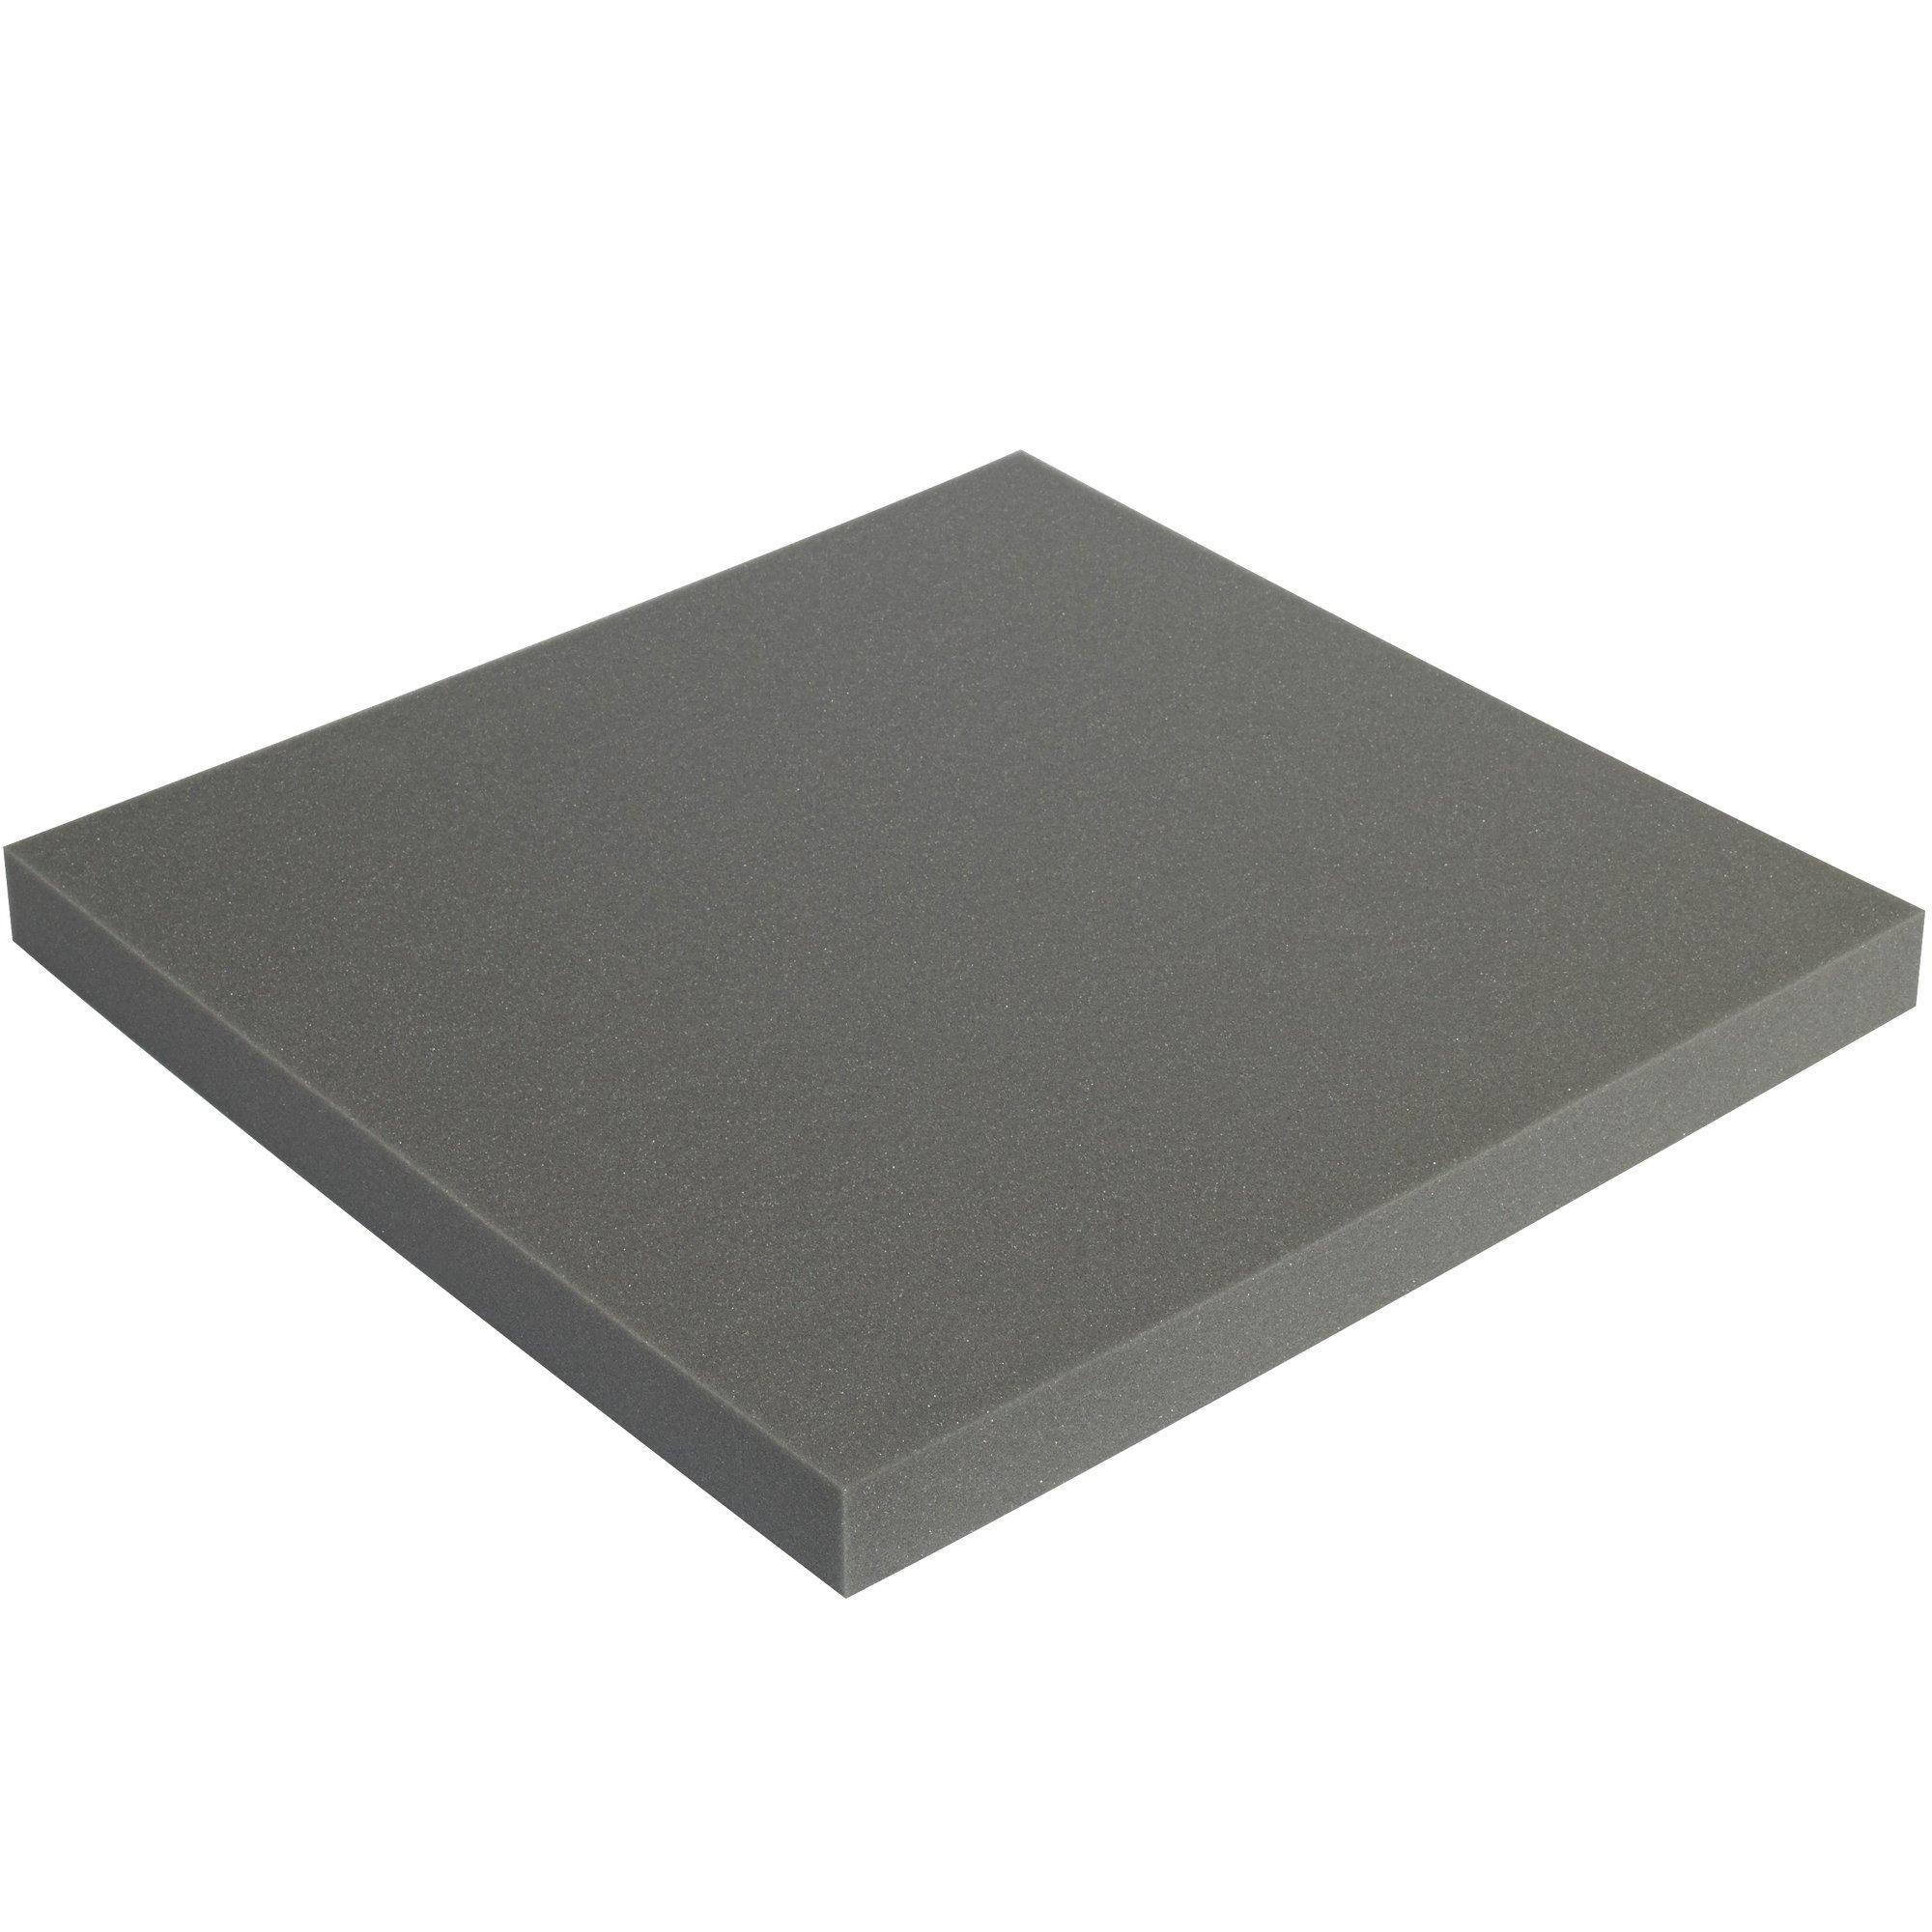 BOX USA BFSC12121 Soft Foam Sheets, 1'' x 12'' x 12'', Charcoal (Pack of 48) by BOX USA